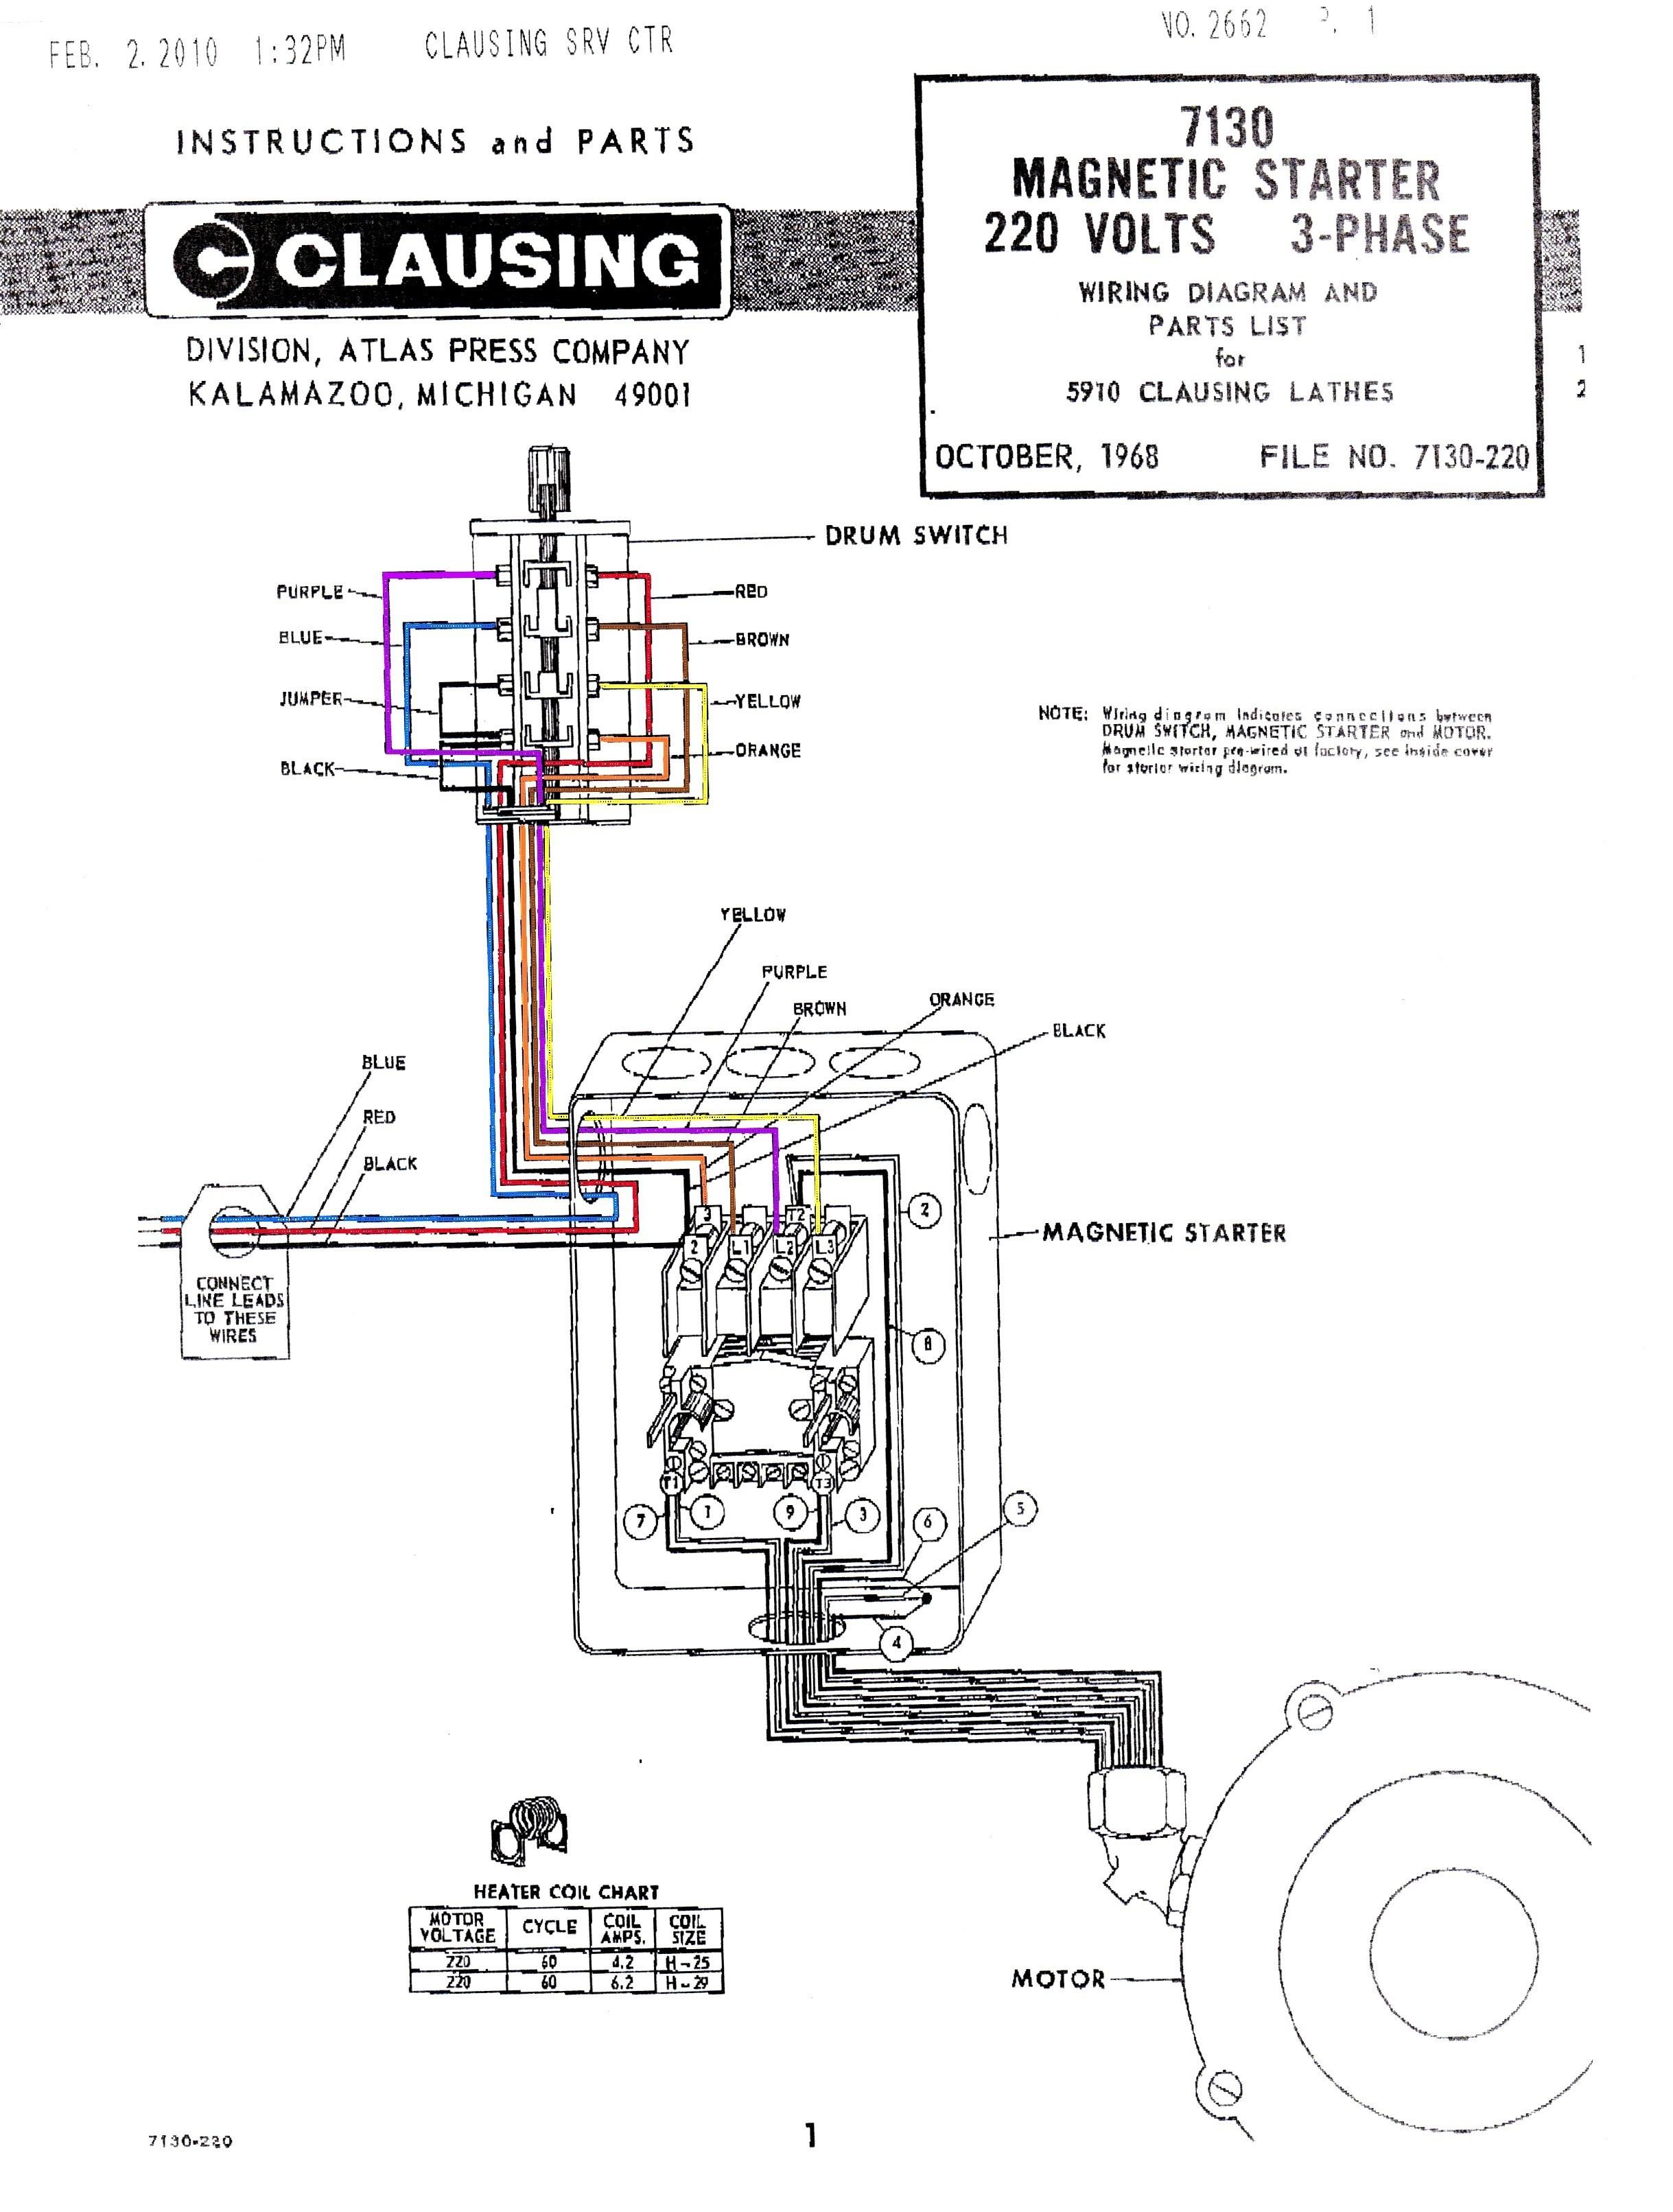 Motor Contactor Wiring Diagram Cutler Hammer Wiring Diagrams Of Motor Contactor Wiring Diagram